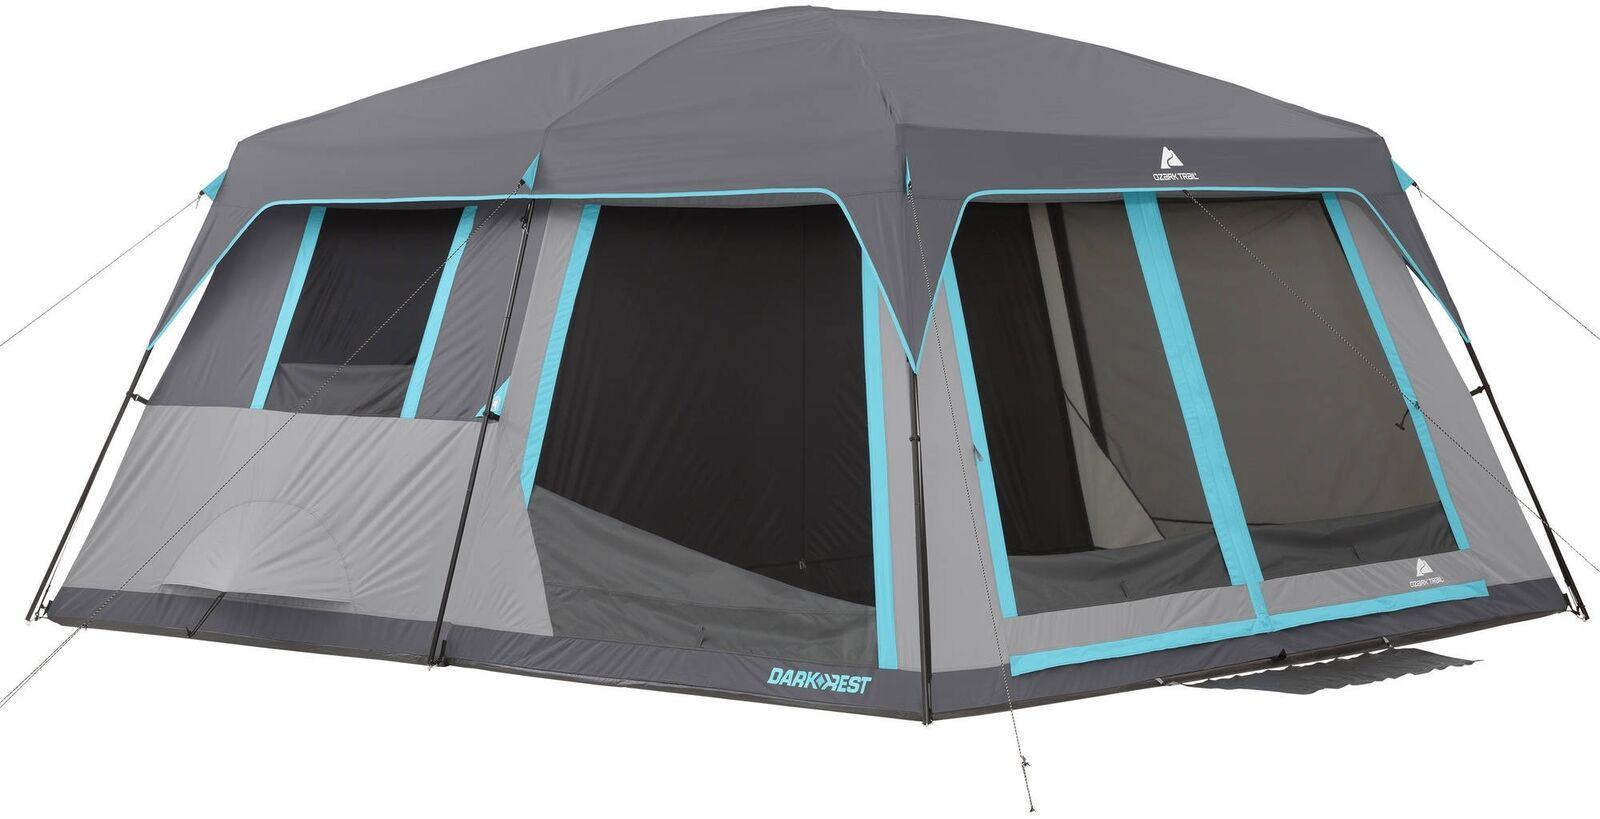 Ozark Trail Half Dark Dark Dark Rest Frp Cabin Tent Polyester BuiltIn Room 12 Person a50fee